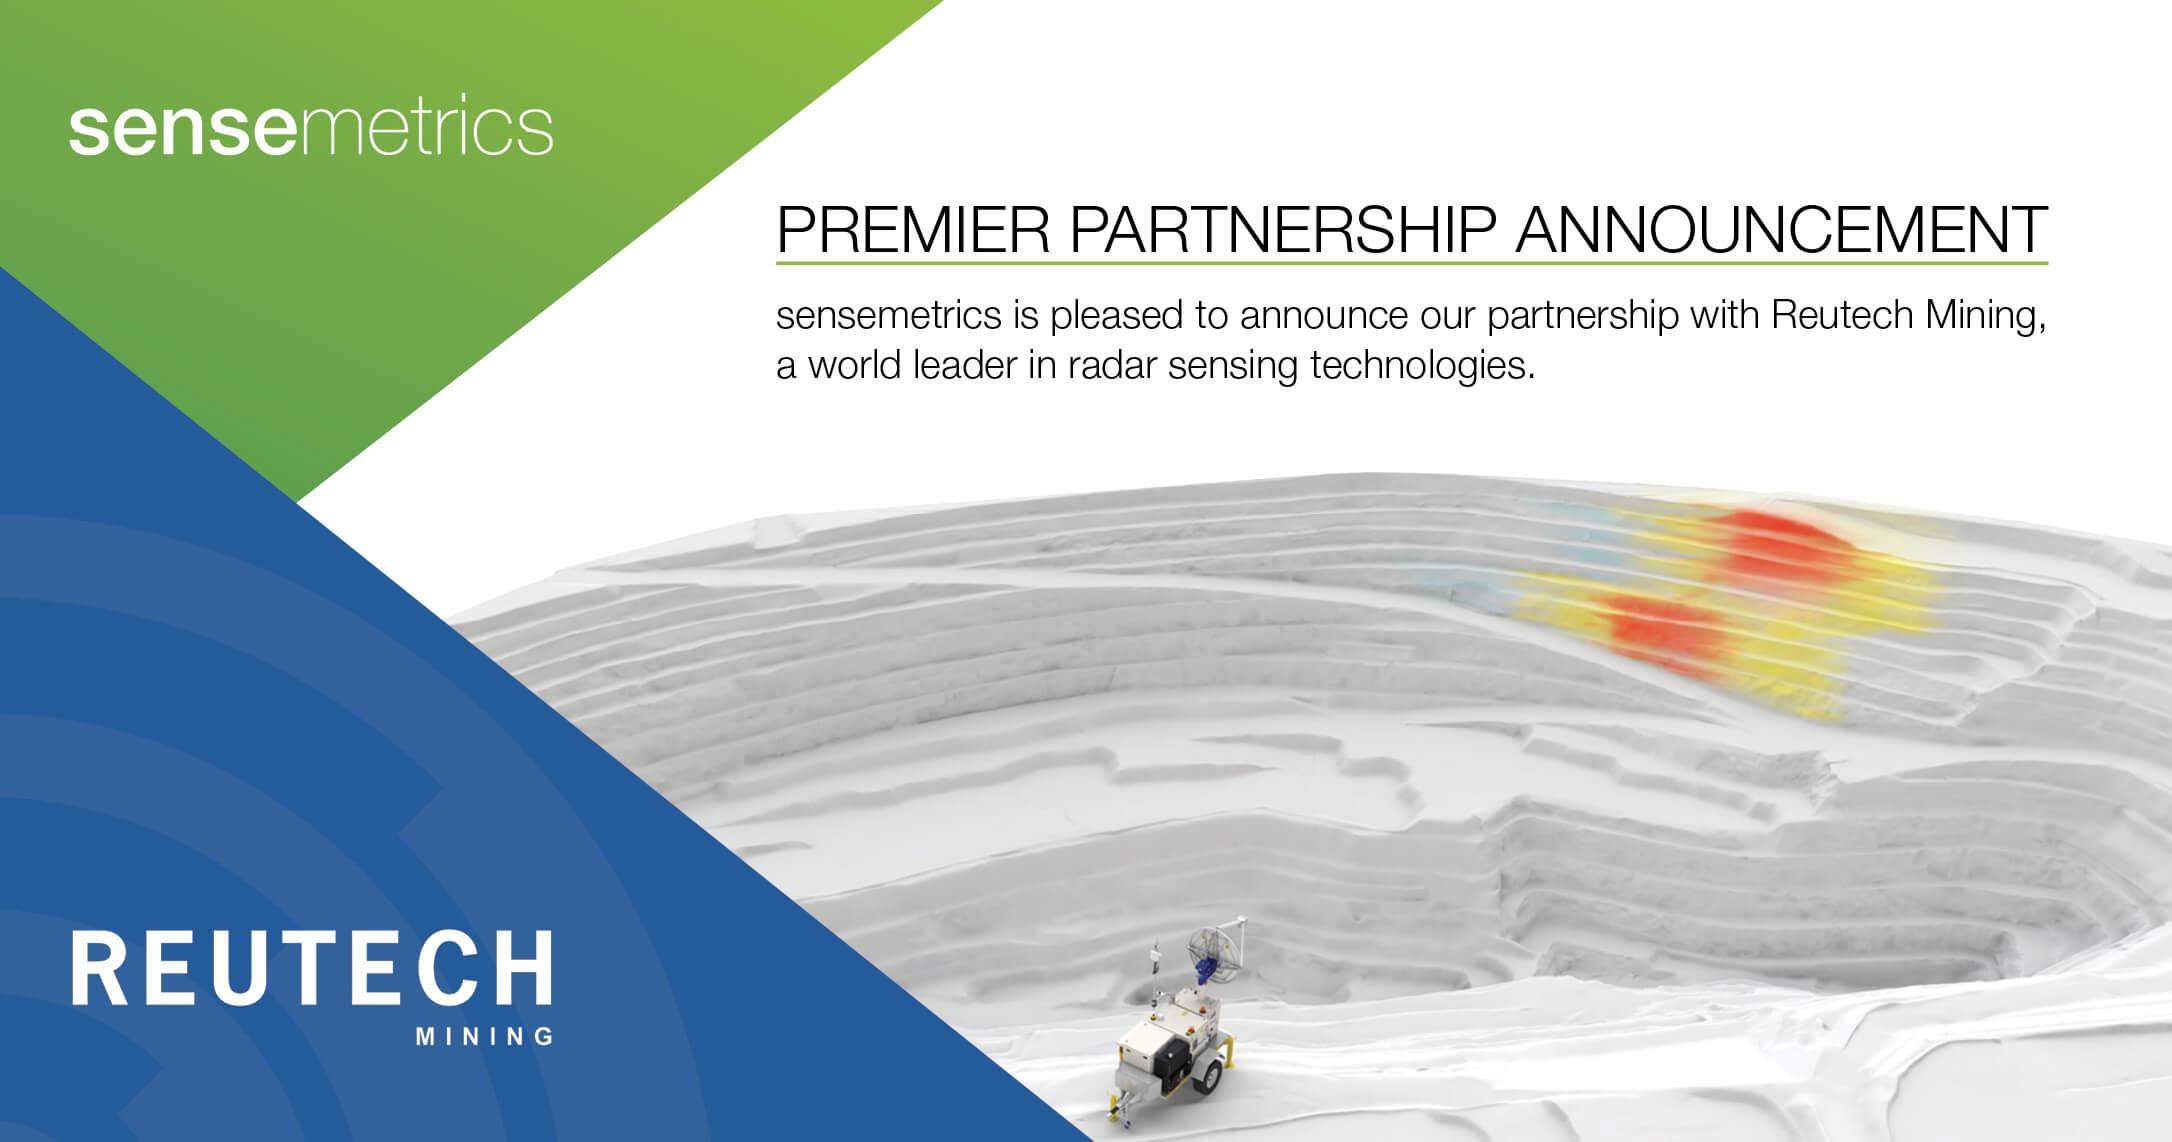 sensemetrics Partners with Reutech Mining